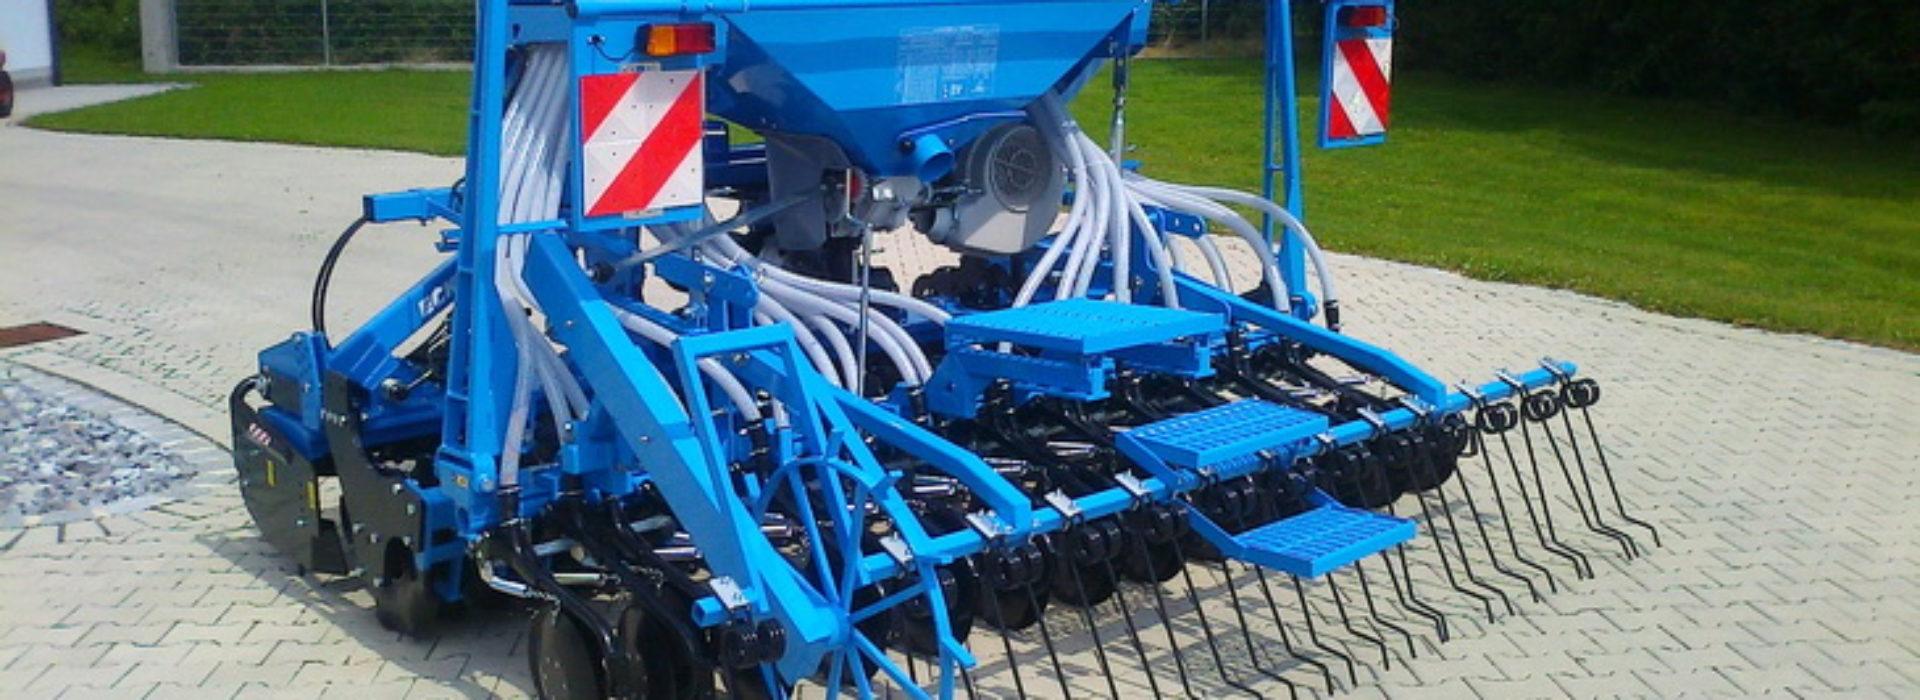 01-pneutec-drill-as3000-sk-730x487